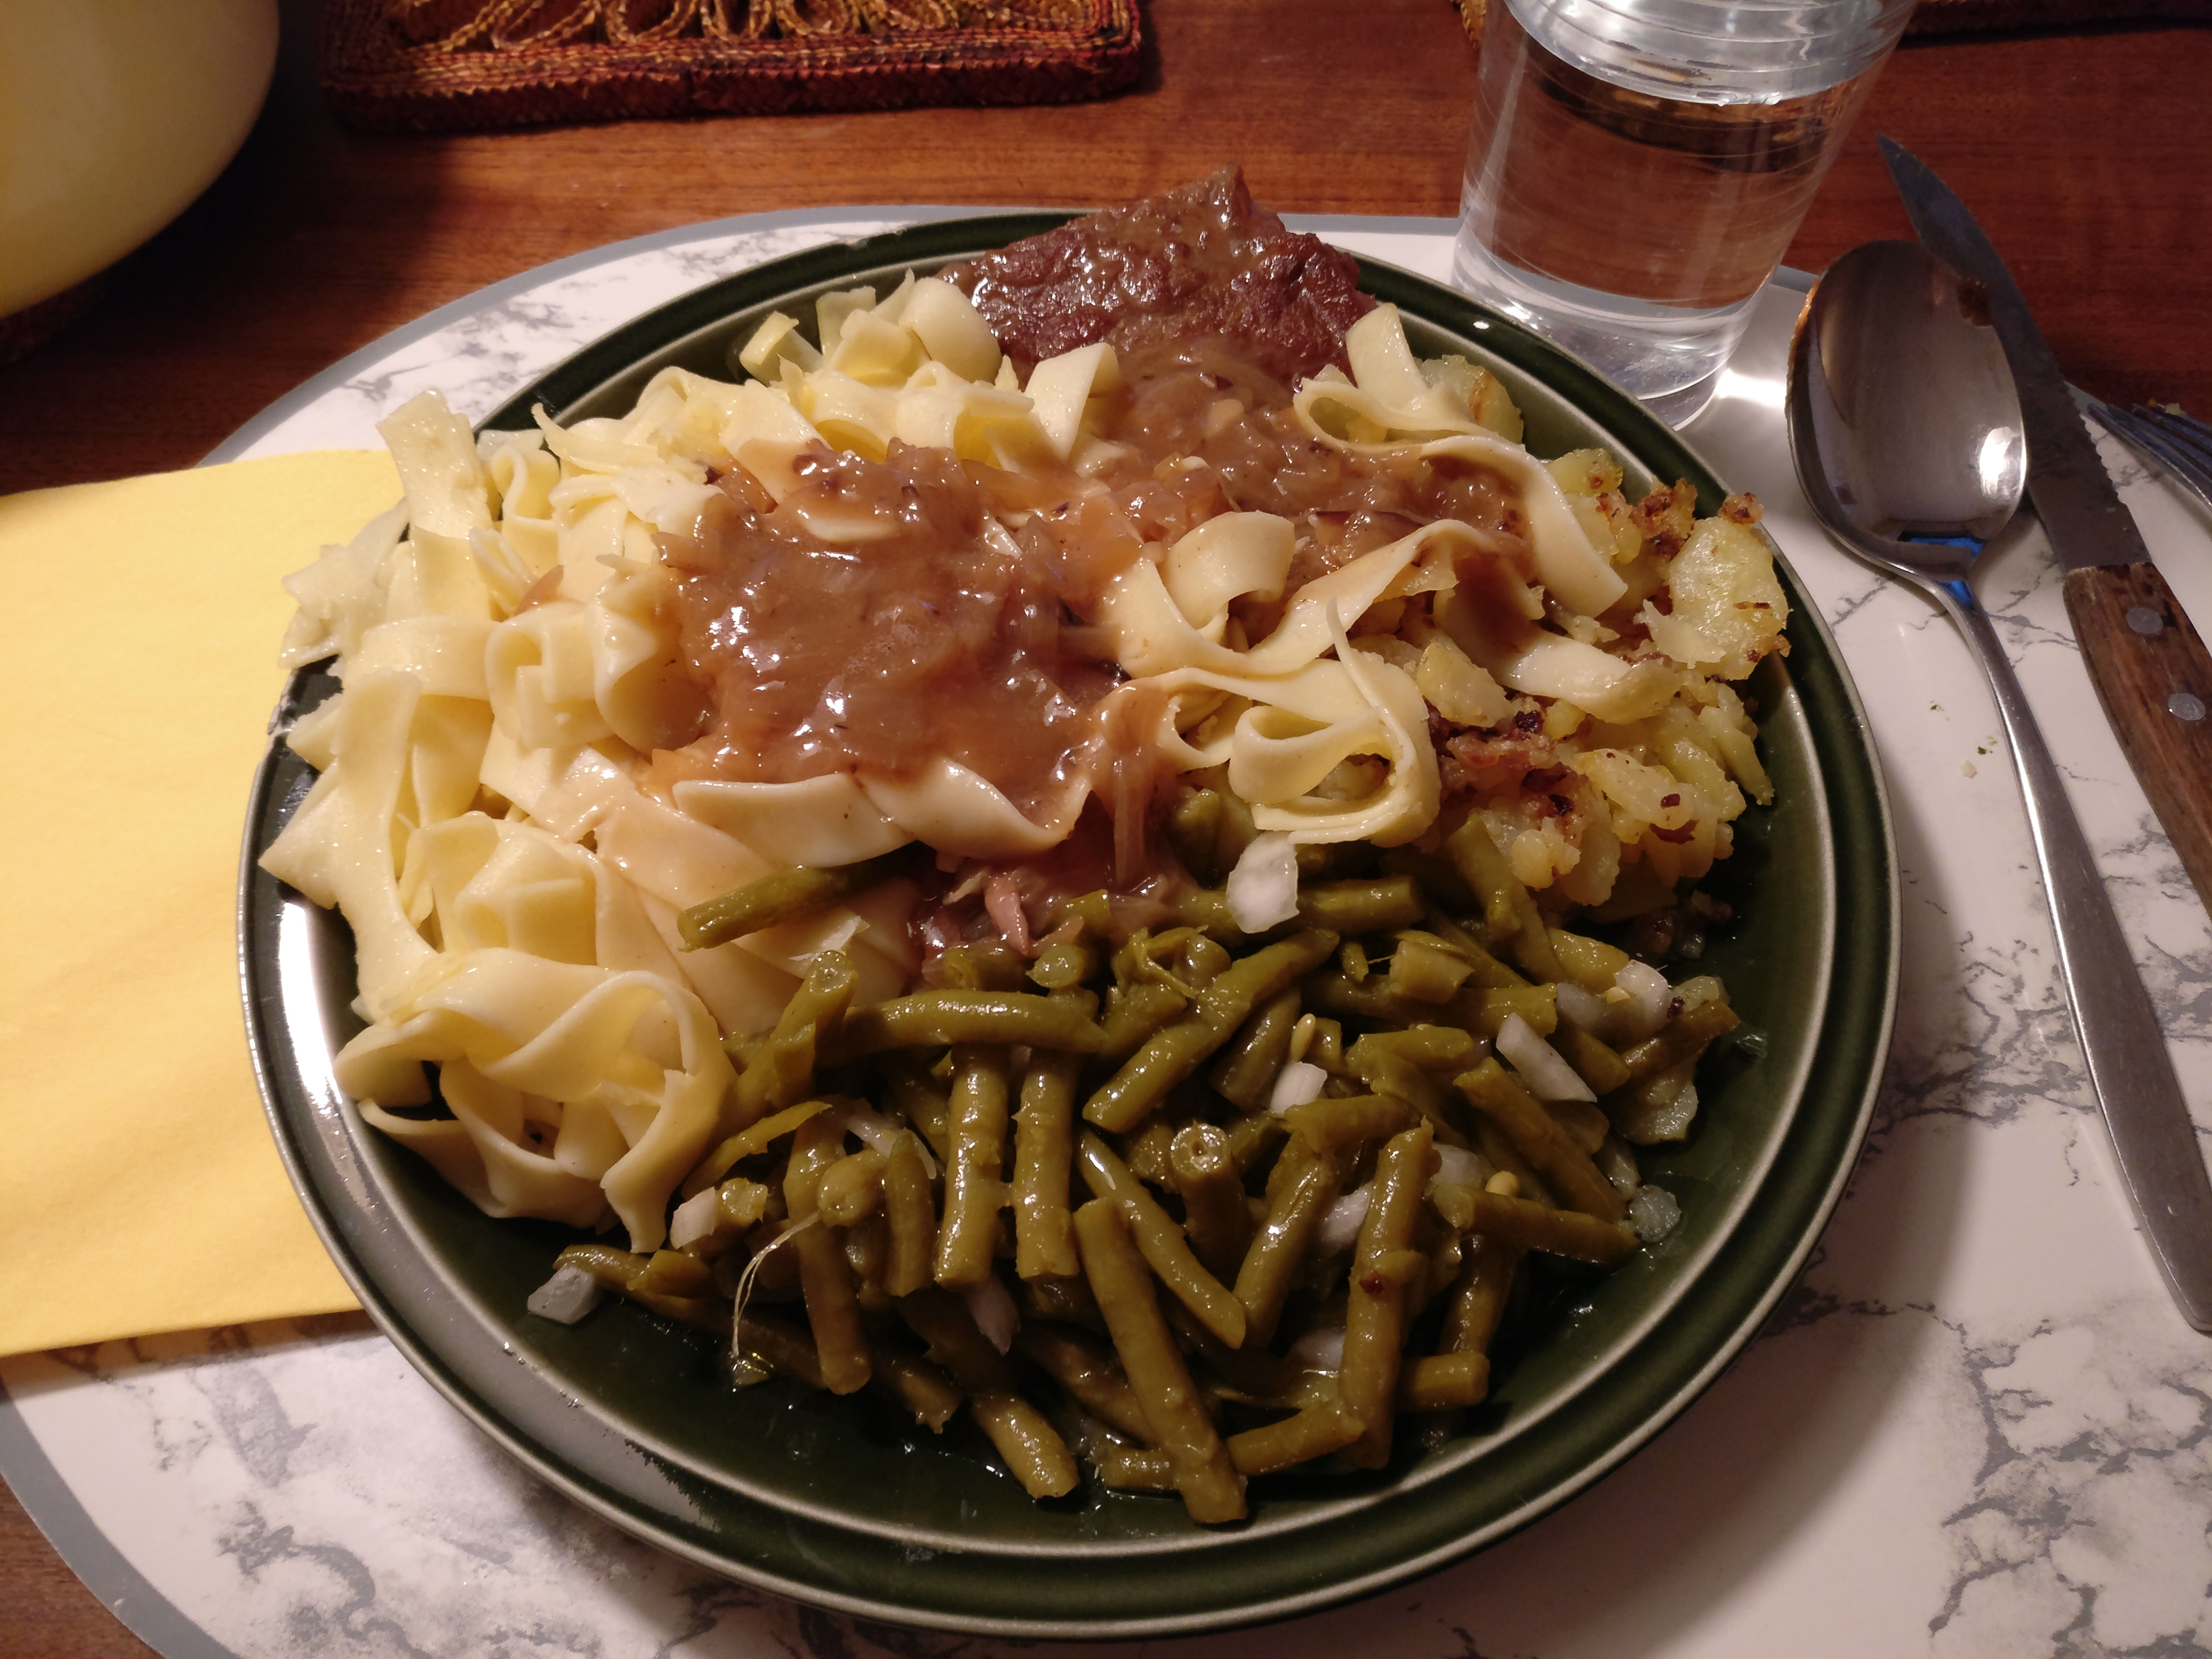 https://foodloader.net/nico_2017-05-31_zwiebelrostbraten-nudeln-bratkartoffeln-bohnensalat.jpg